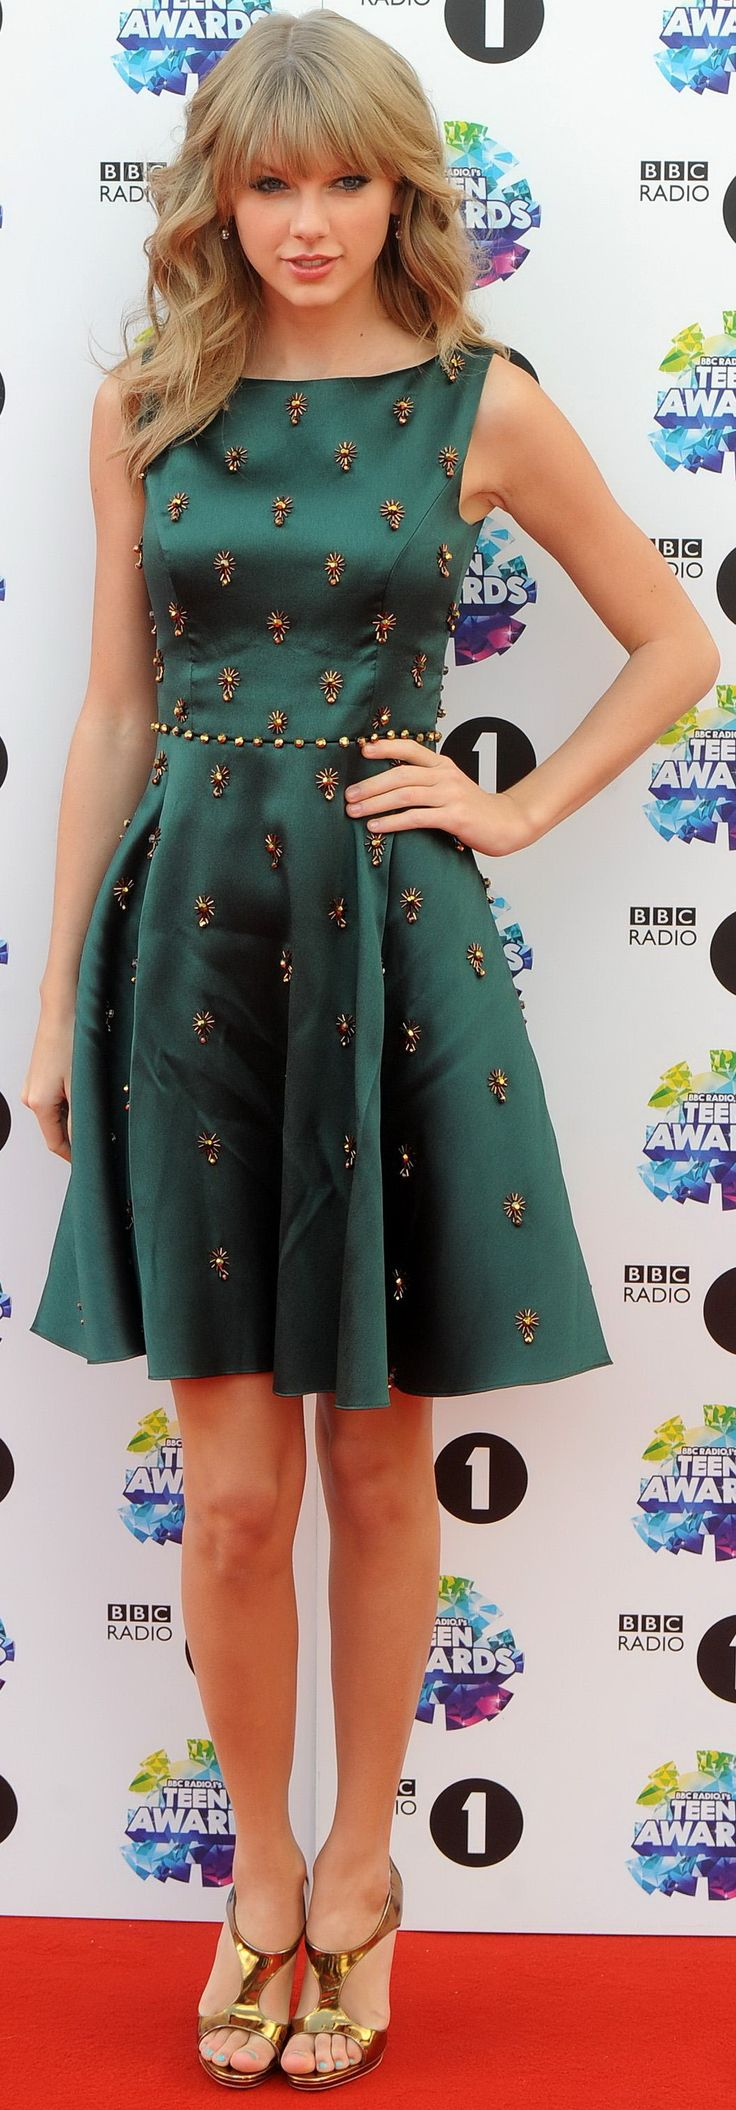 Taylor Swift. Jenny Packham dress at TCAs.